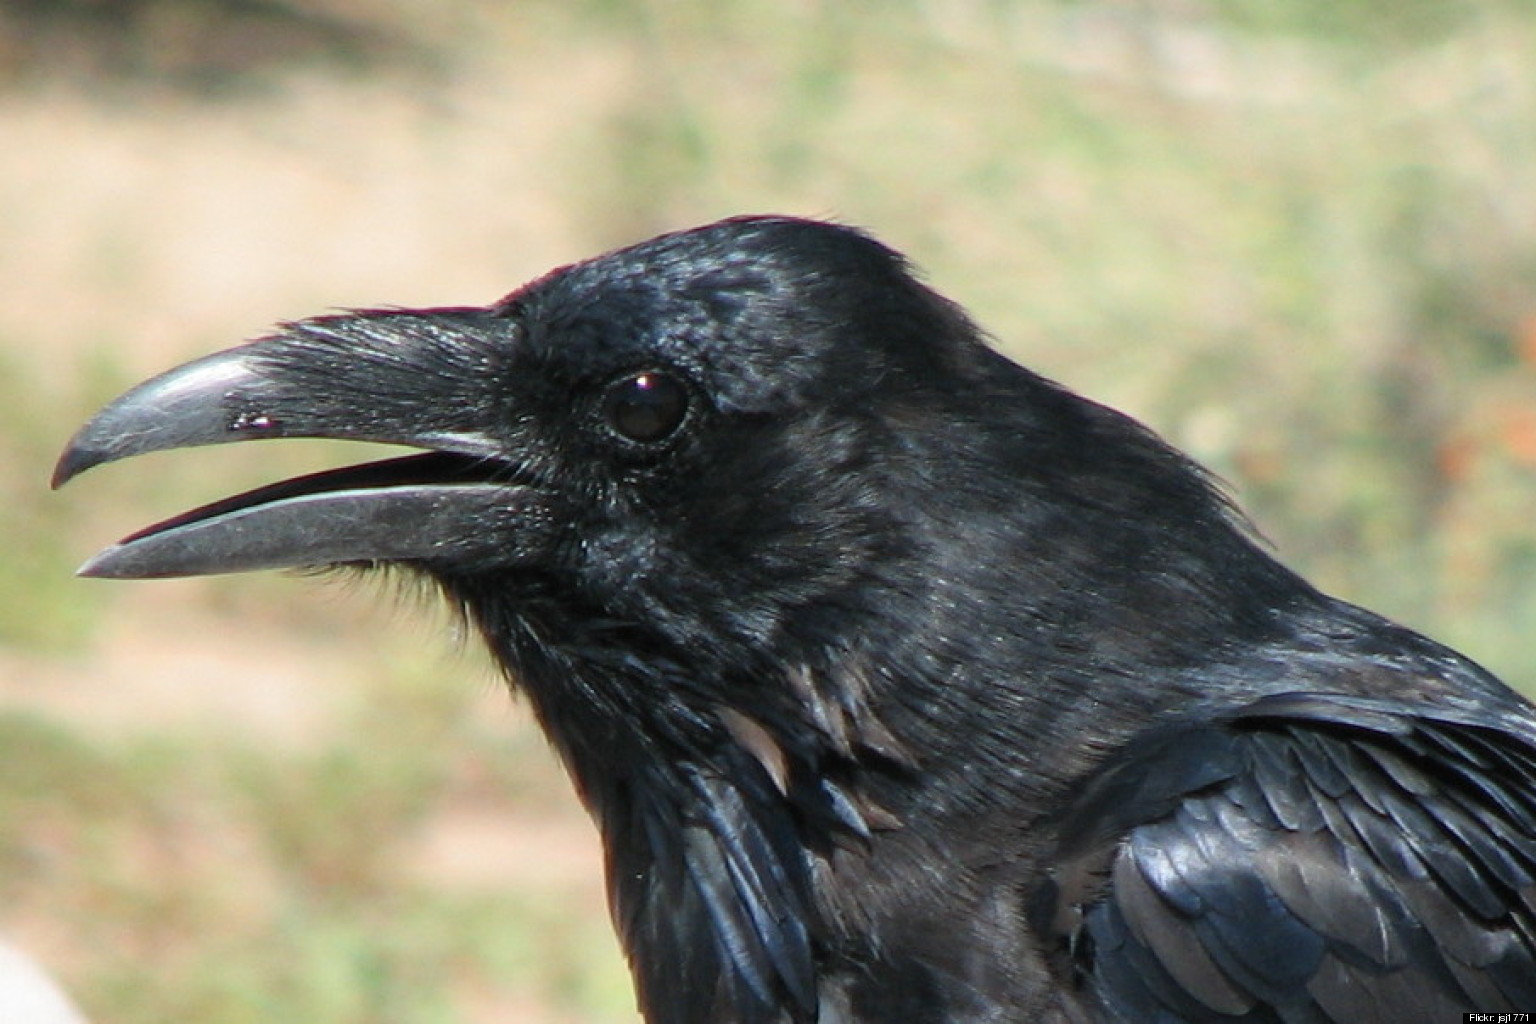 raven landing front view